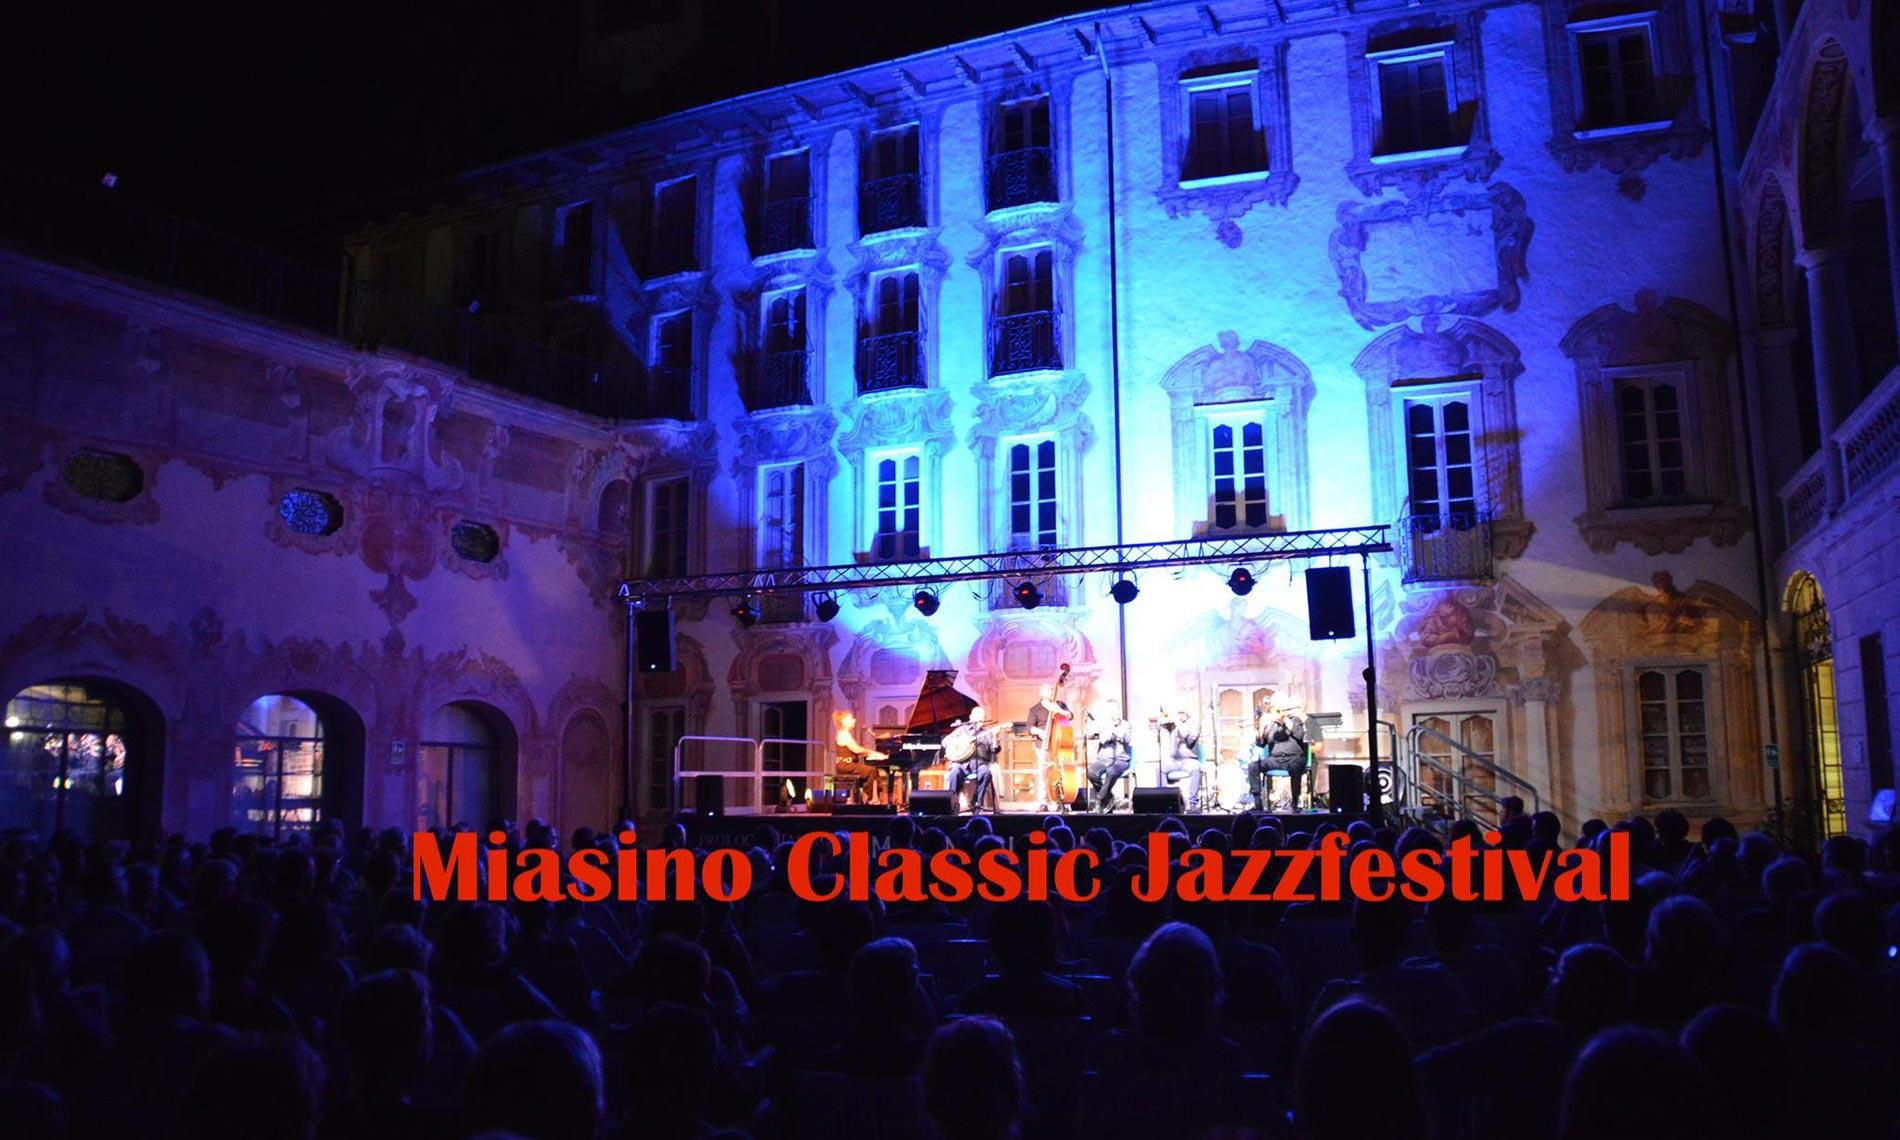 Miasino Classic Jazzfestival